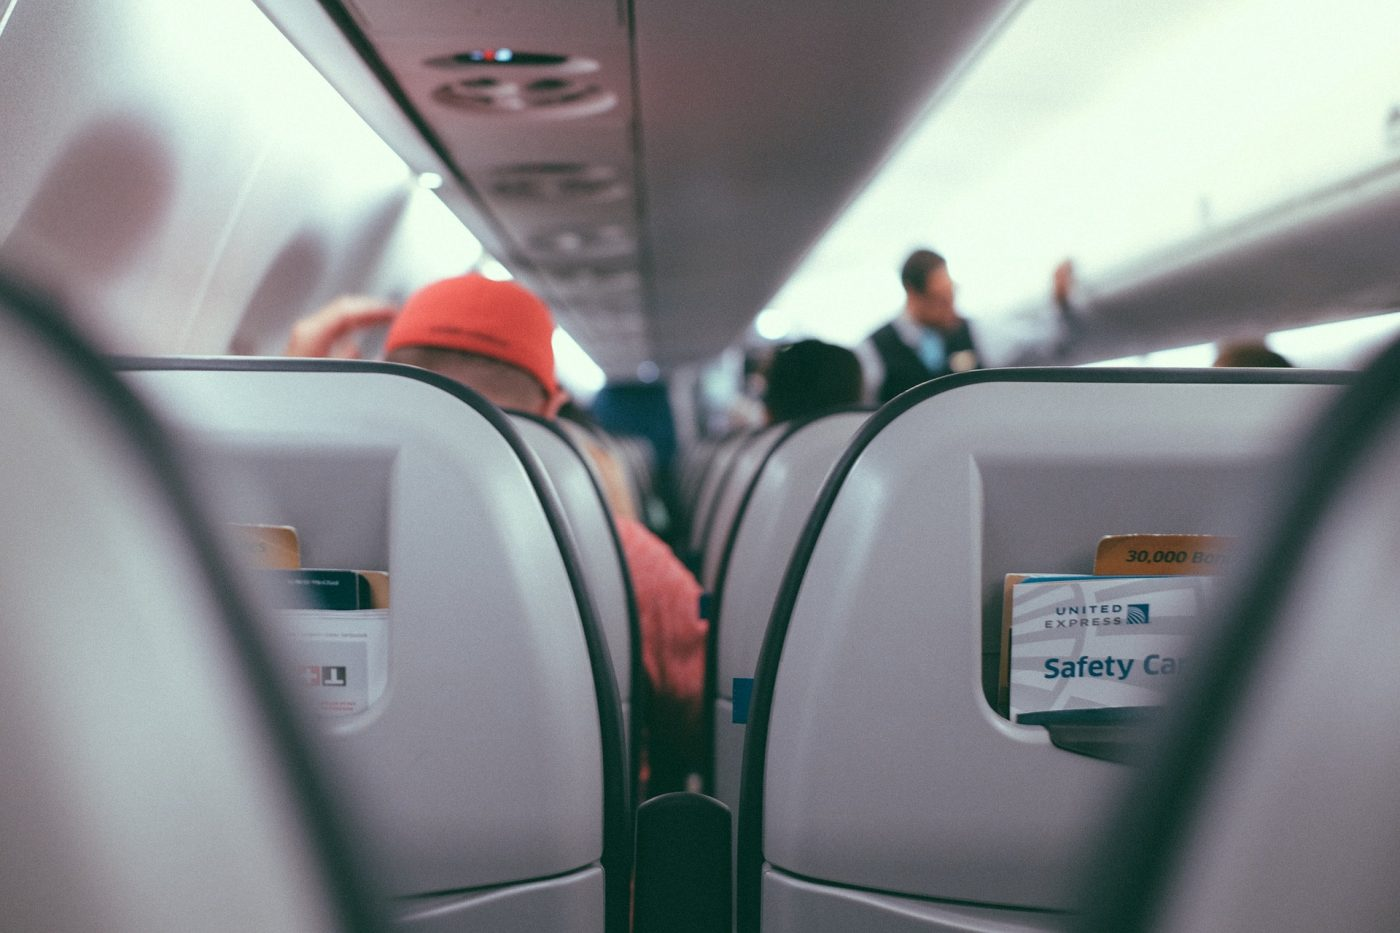 carbon offset progams, https://pixabay.com/photos/inside-airplane-airline-travel-2601081/